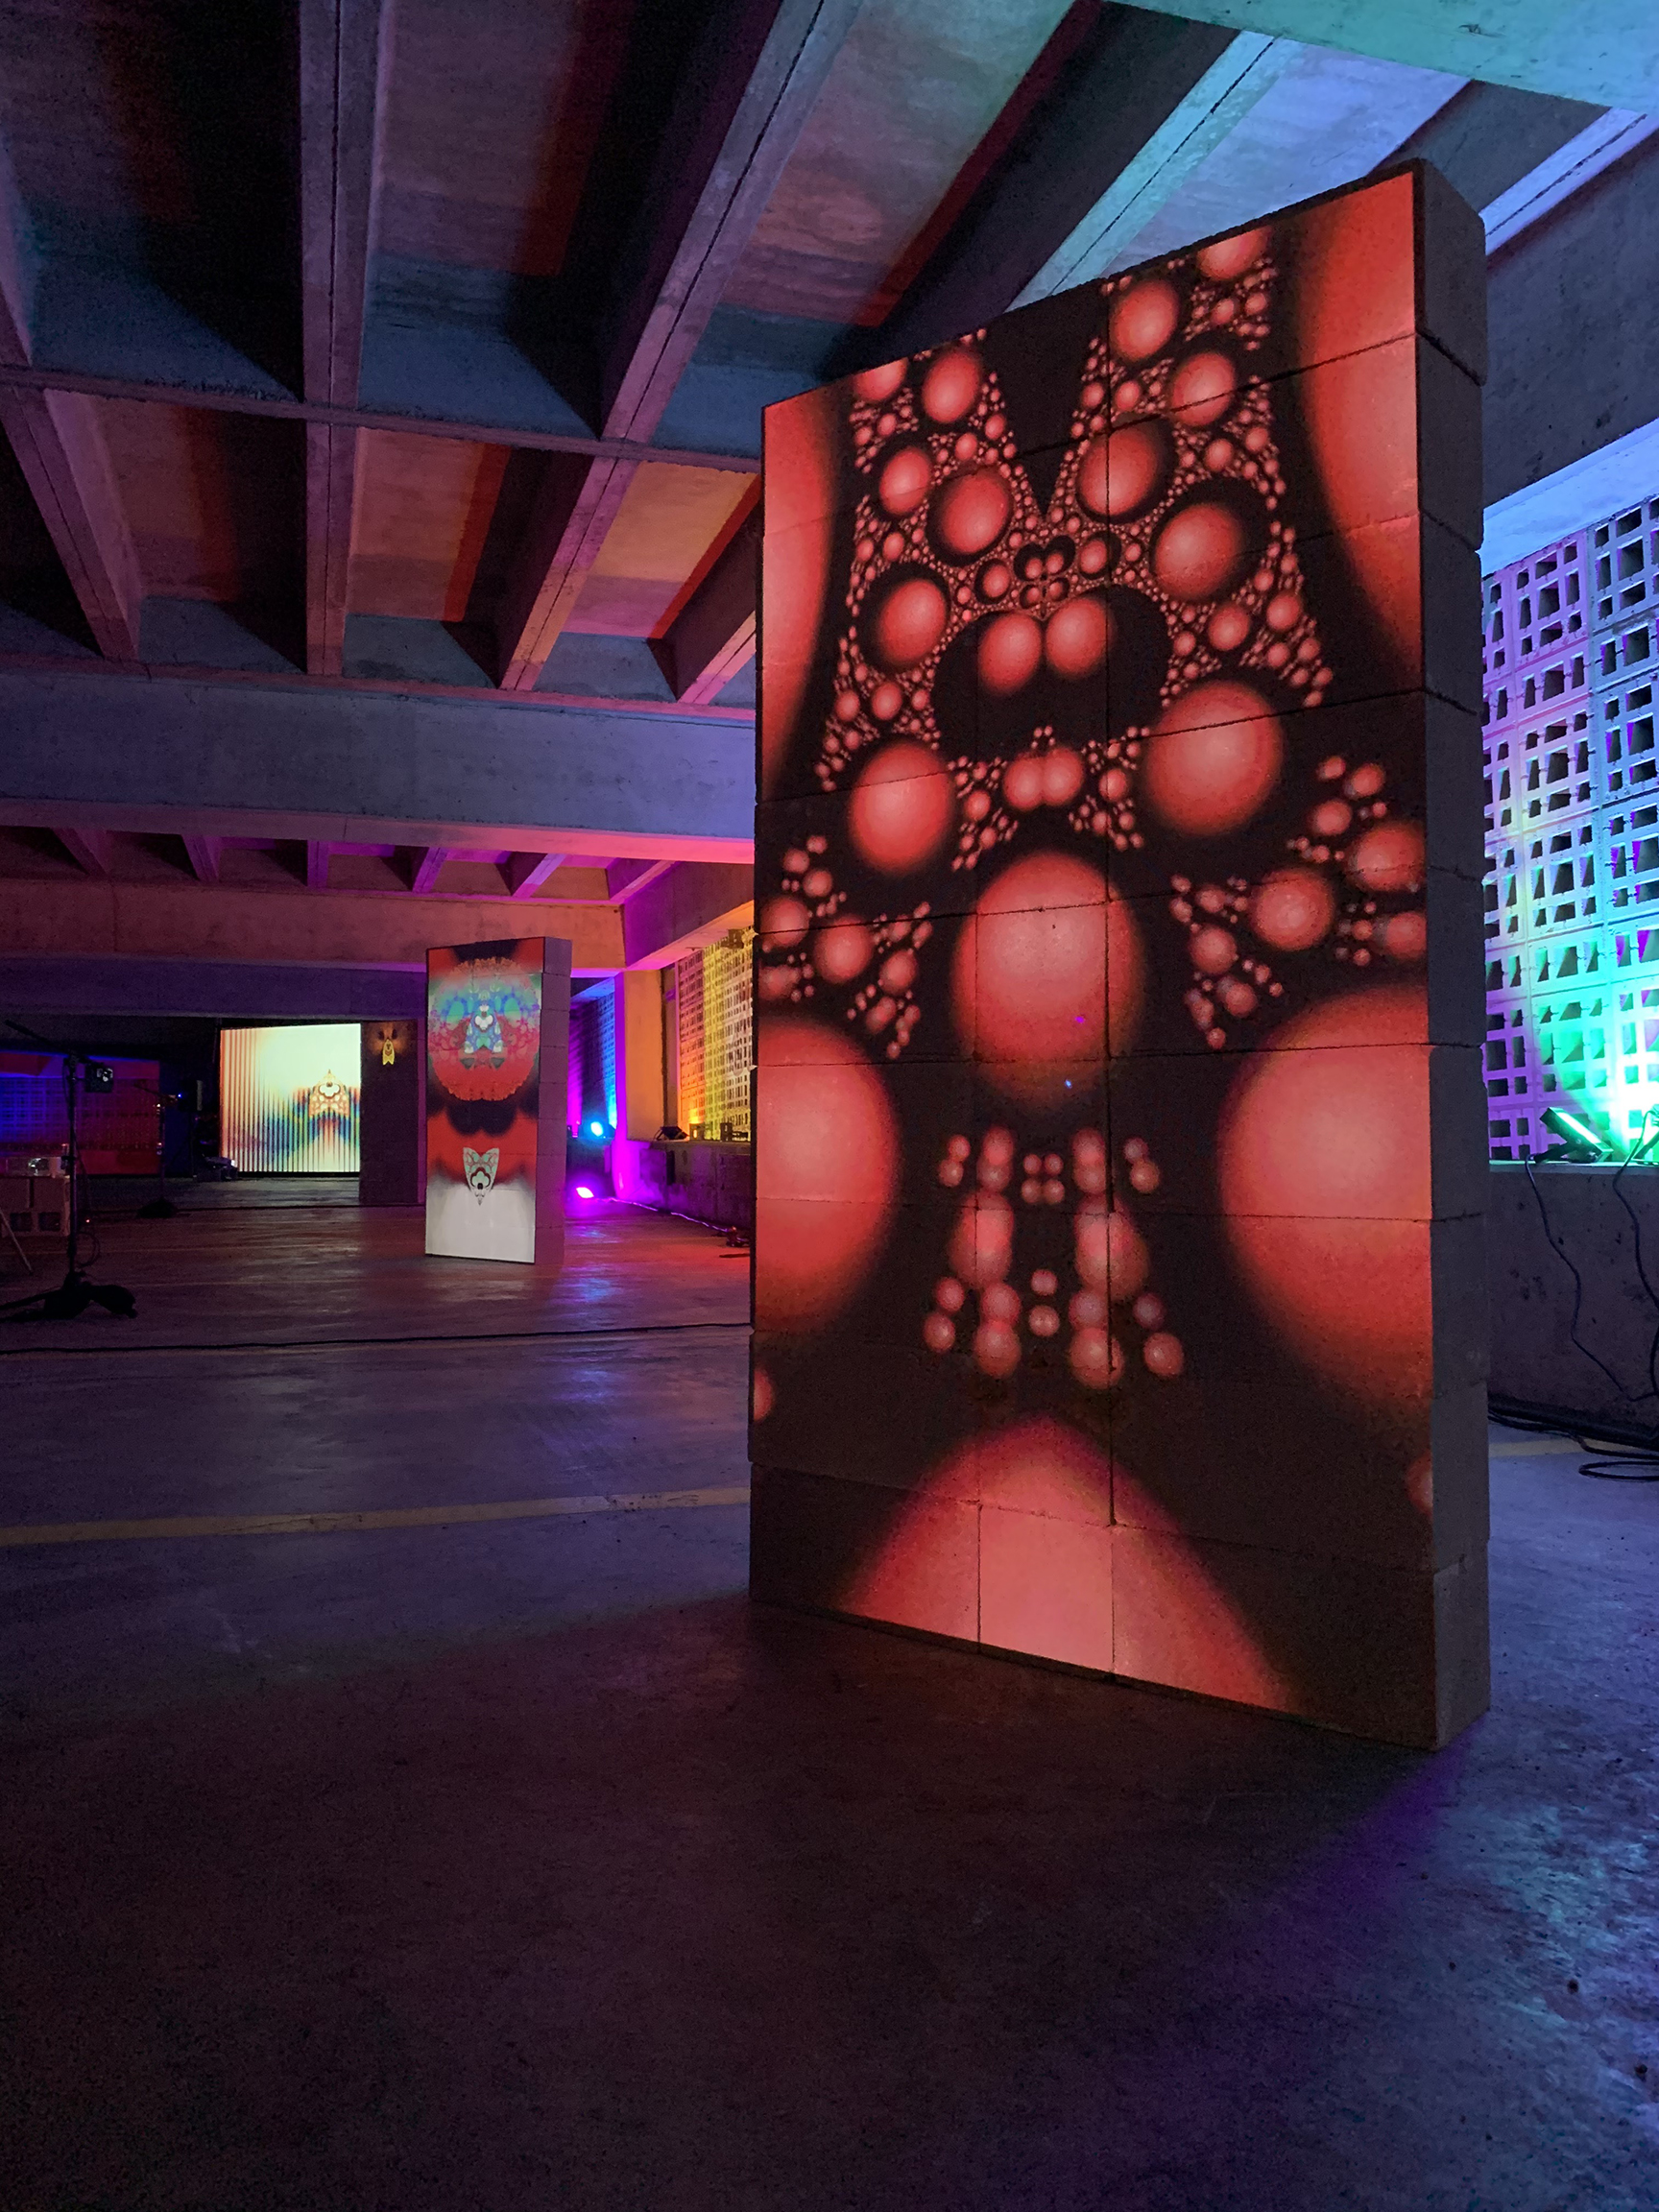 UNT alum, faculty and students transform Dallas parking garage into immersive art exhibit